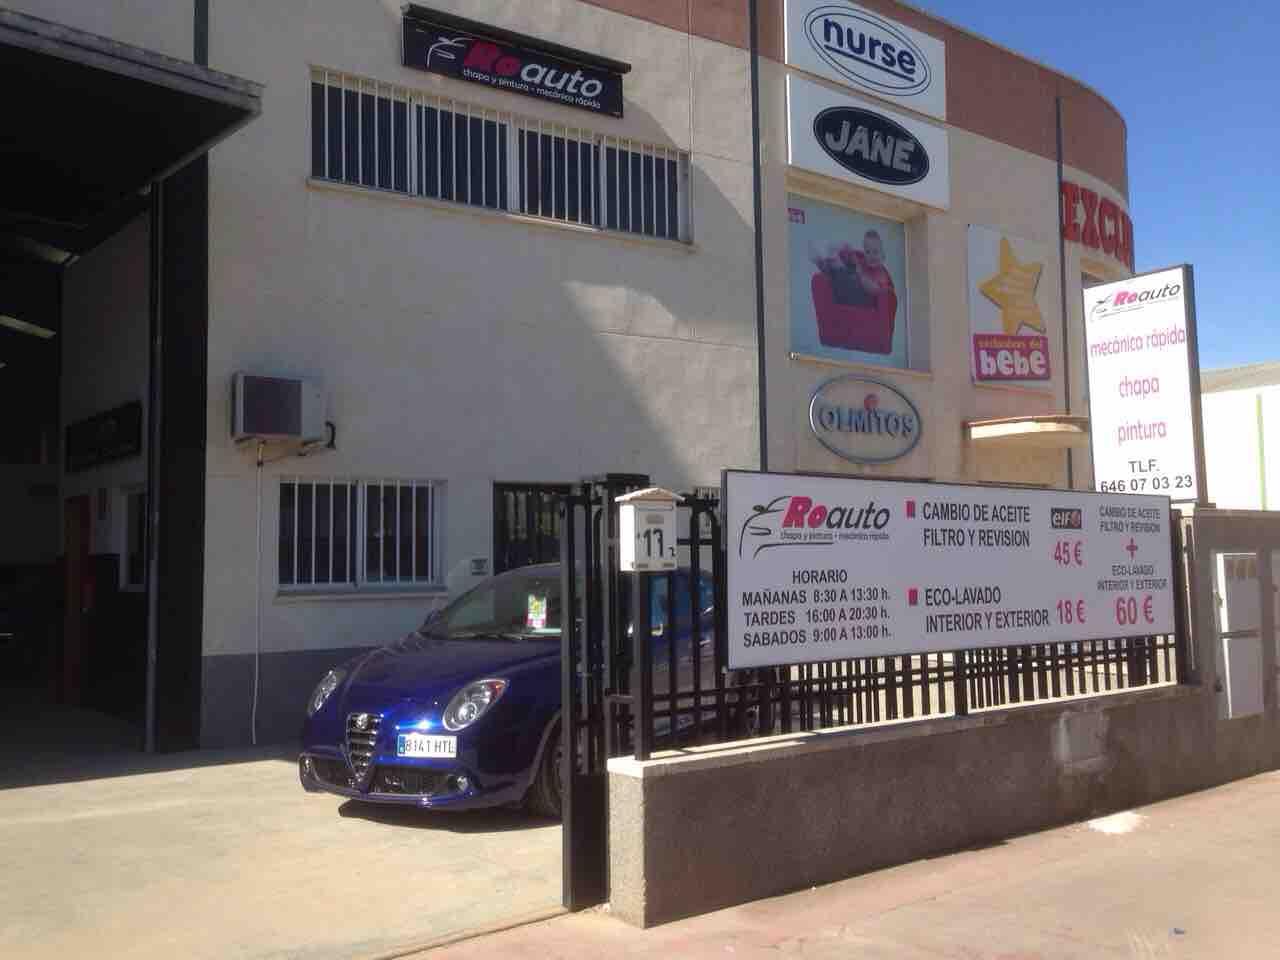 Taller Roauto albacete 2014 S.L. en Albacete